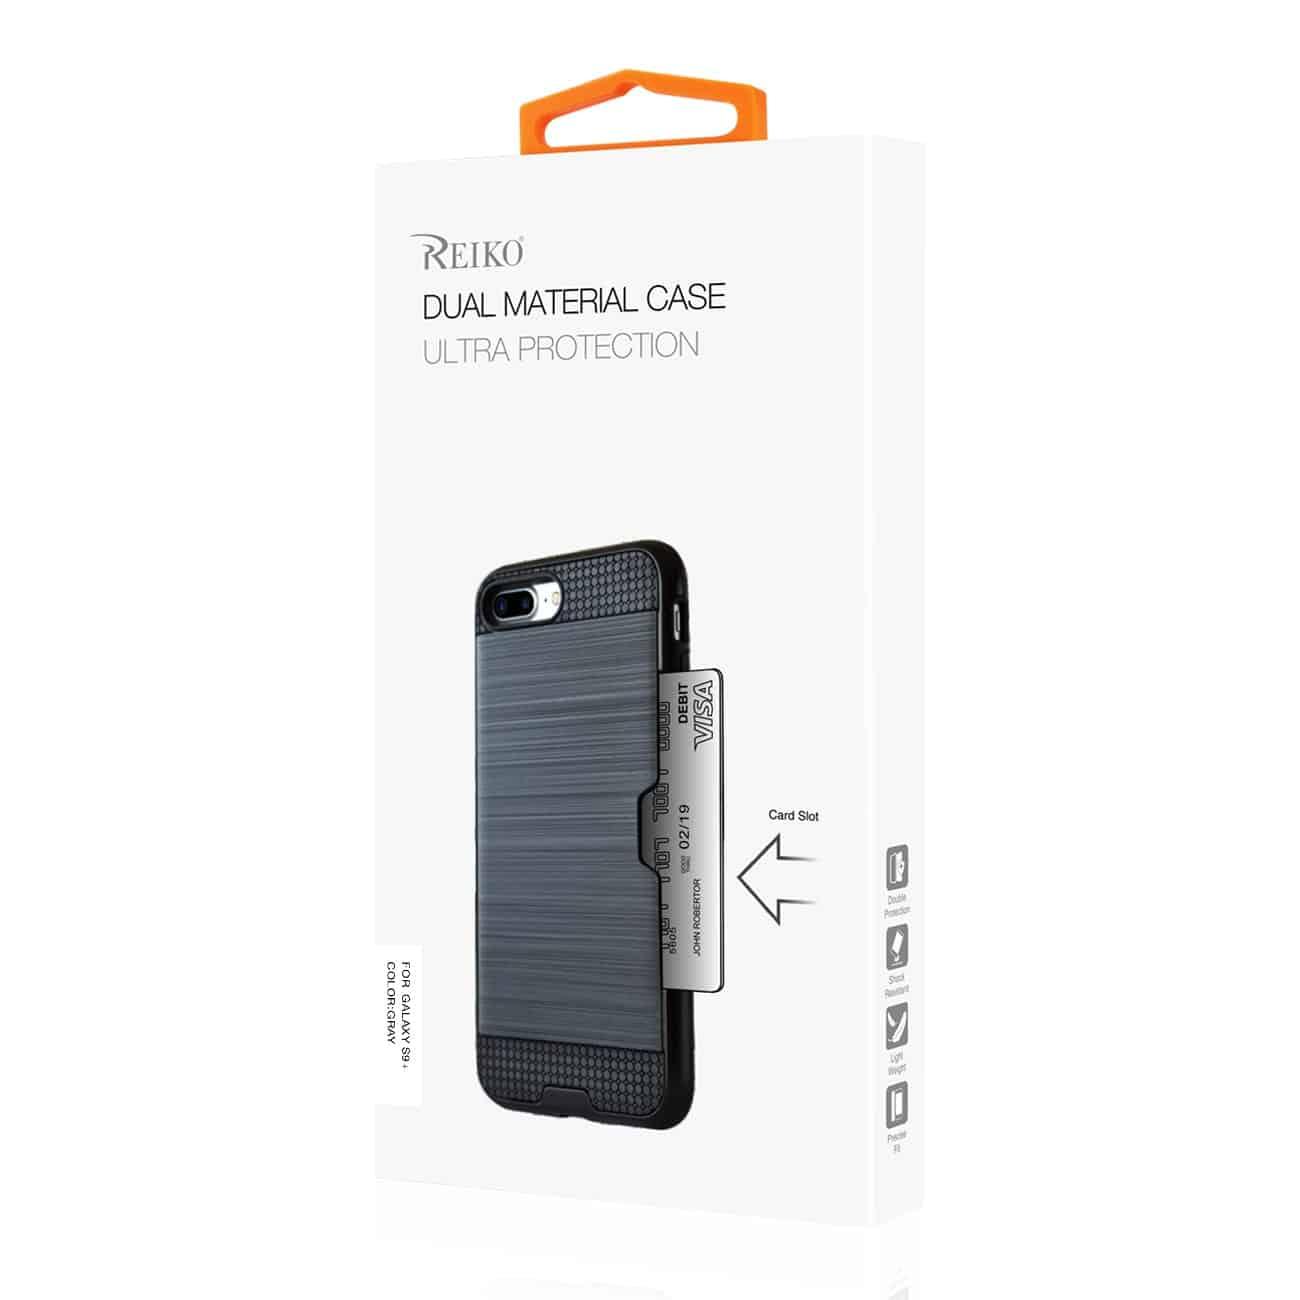 Samsung Galaxy S9 Plus Slim Armor Hybrid Case With Card Holder In Gray